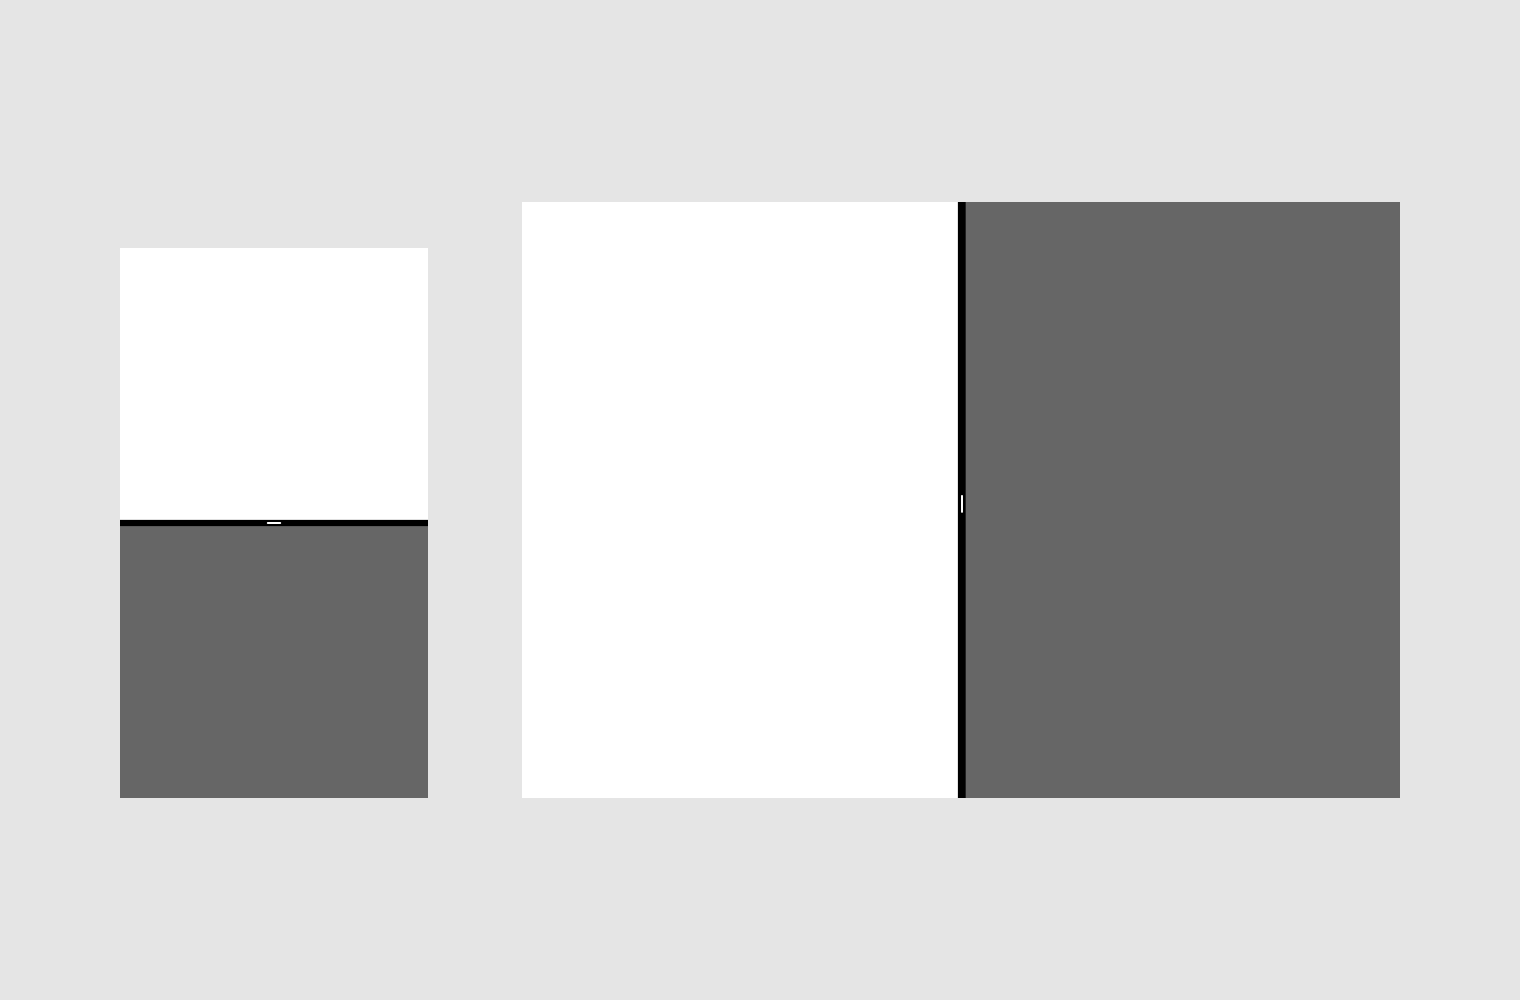 Android split-screen - Material Design